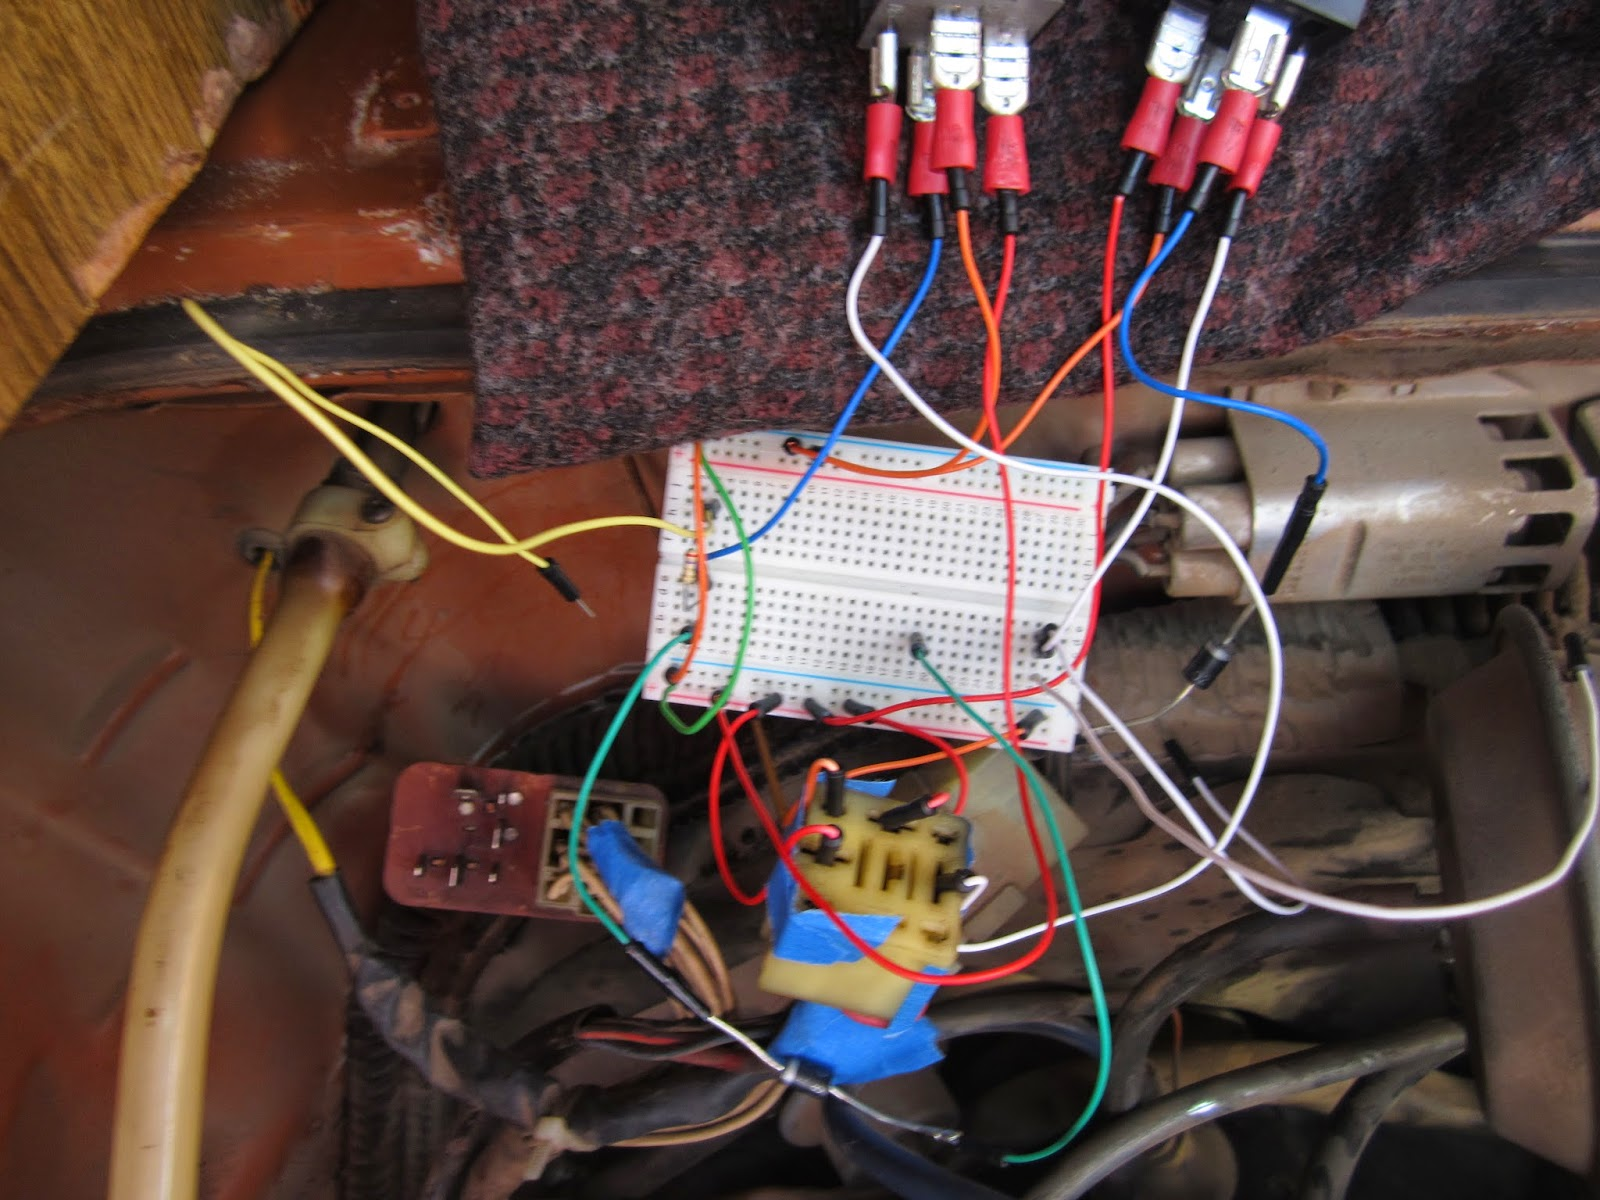 medium resolution of 1982 vanagon fuse diagram wiring diagrams schematics 68 vw bug fuse panel 1982 vanagon fuse box